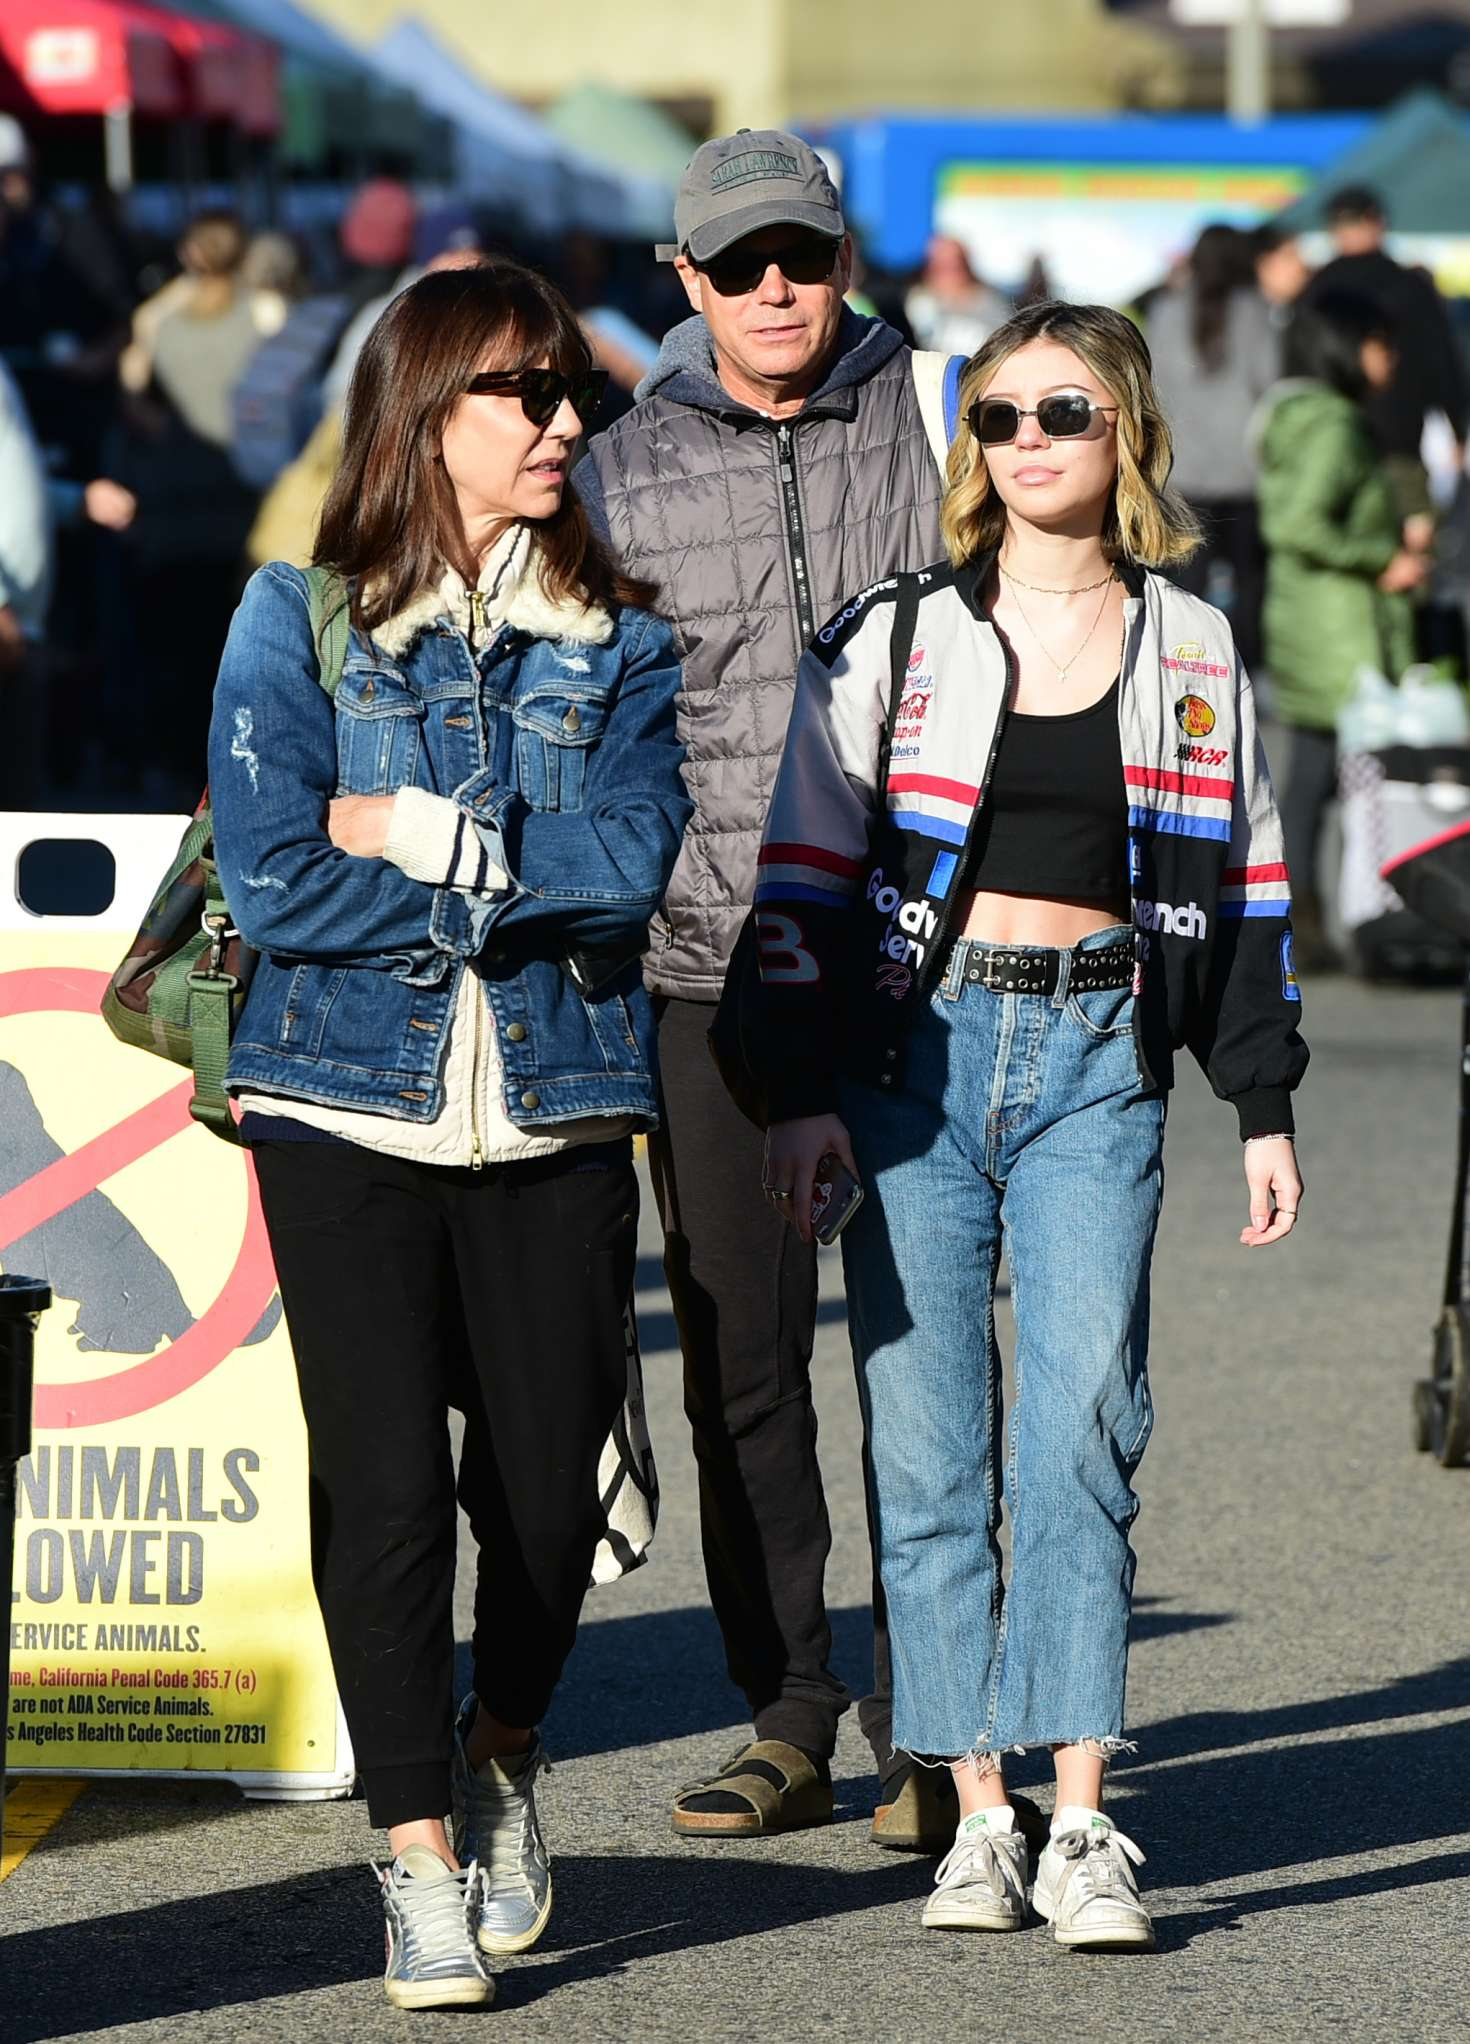 Genevieve Hannelius 2018 : Genevieve Hannelius: Shopping at Farmers Market -03